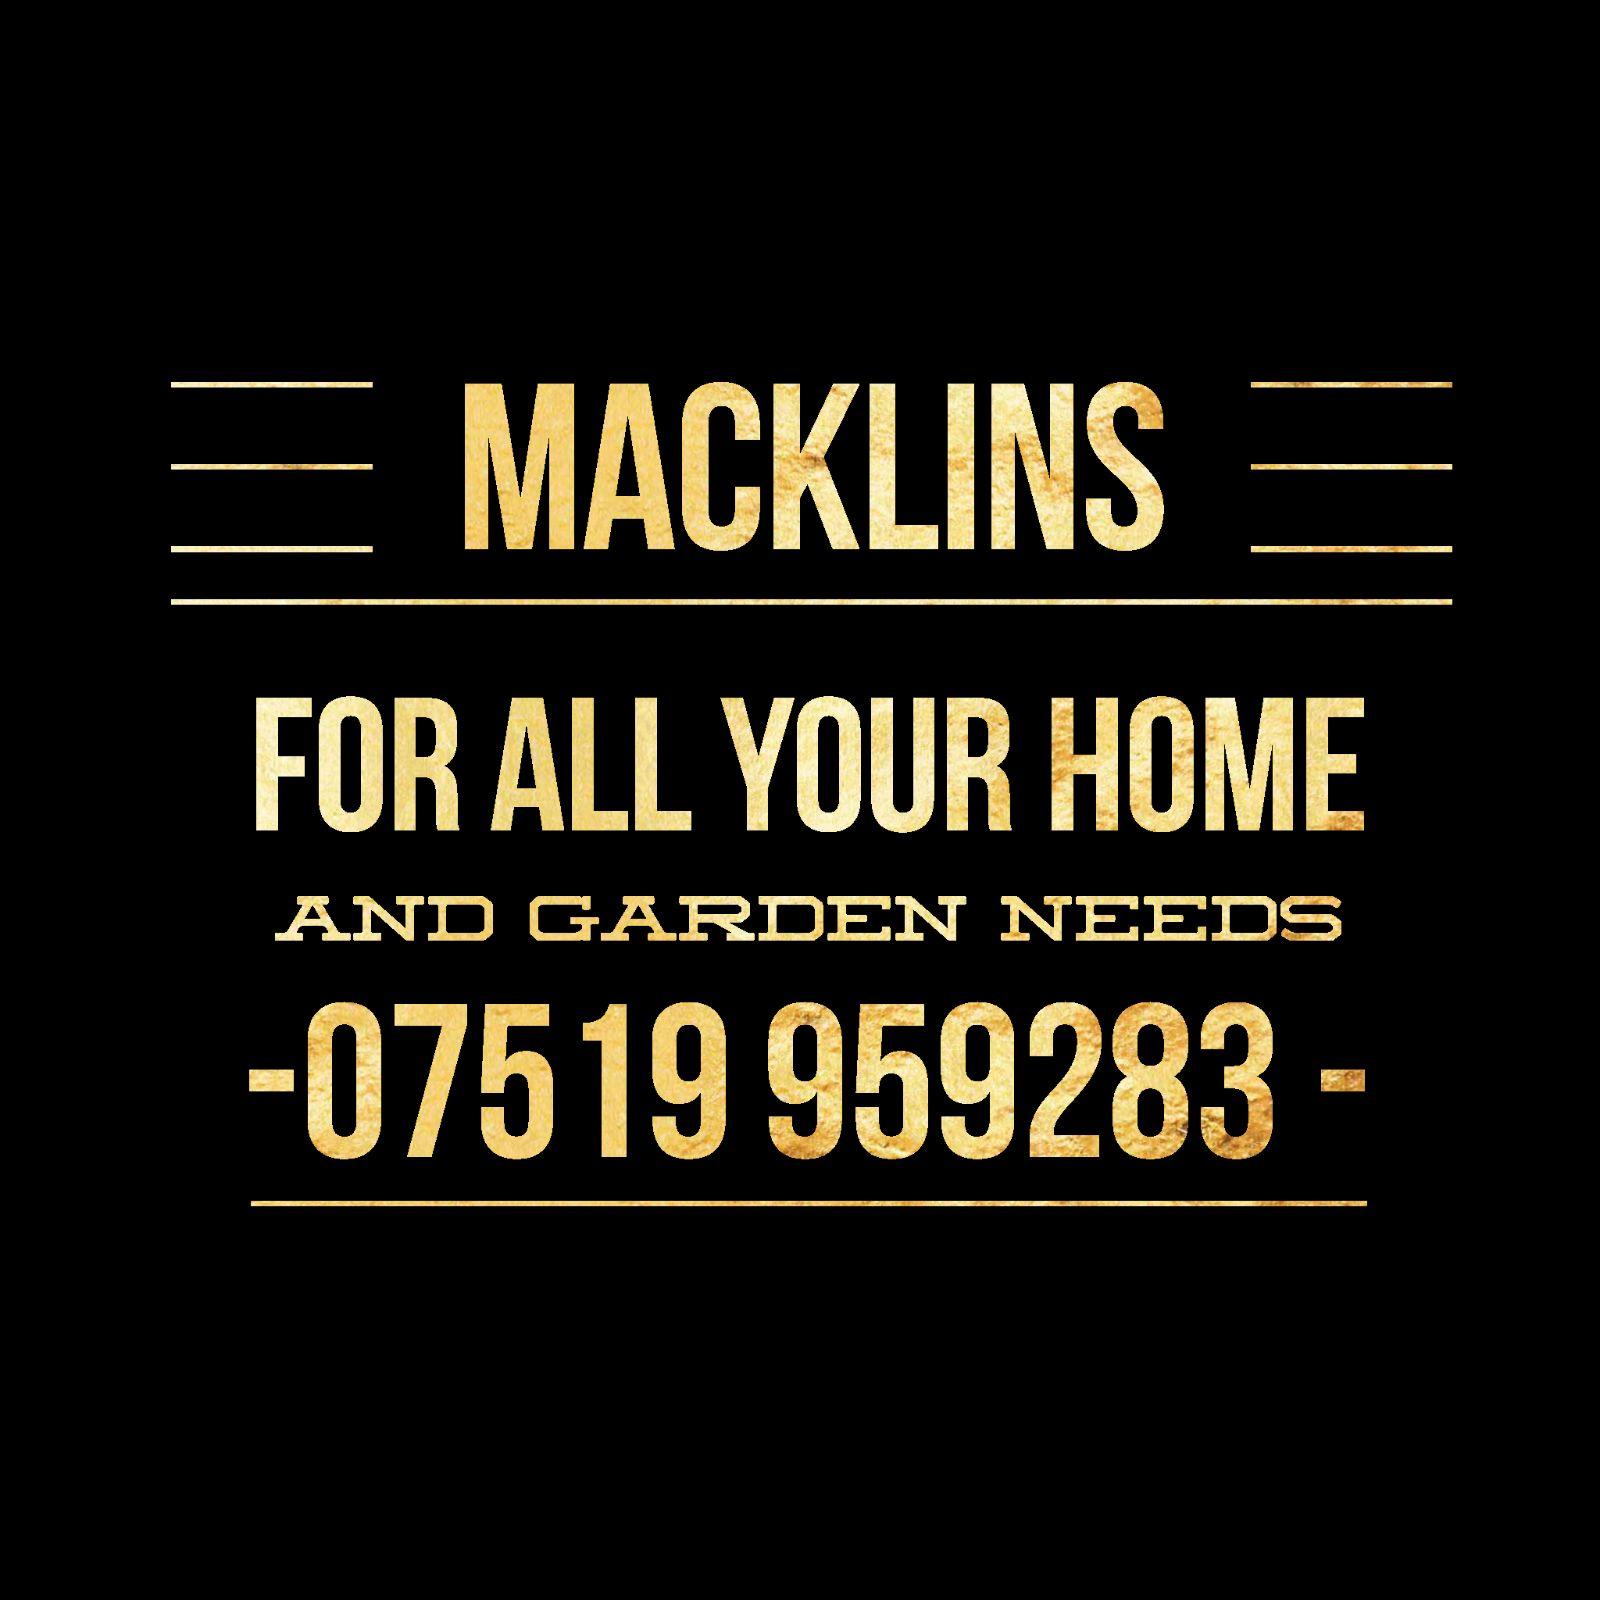 Macklins